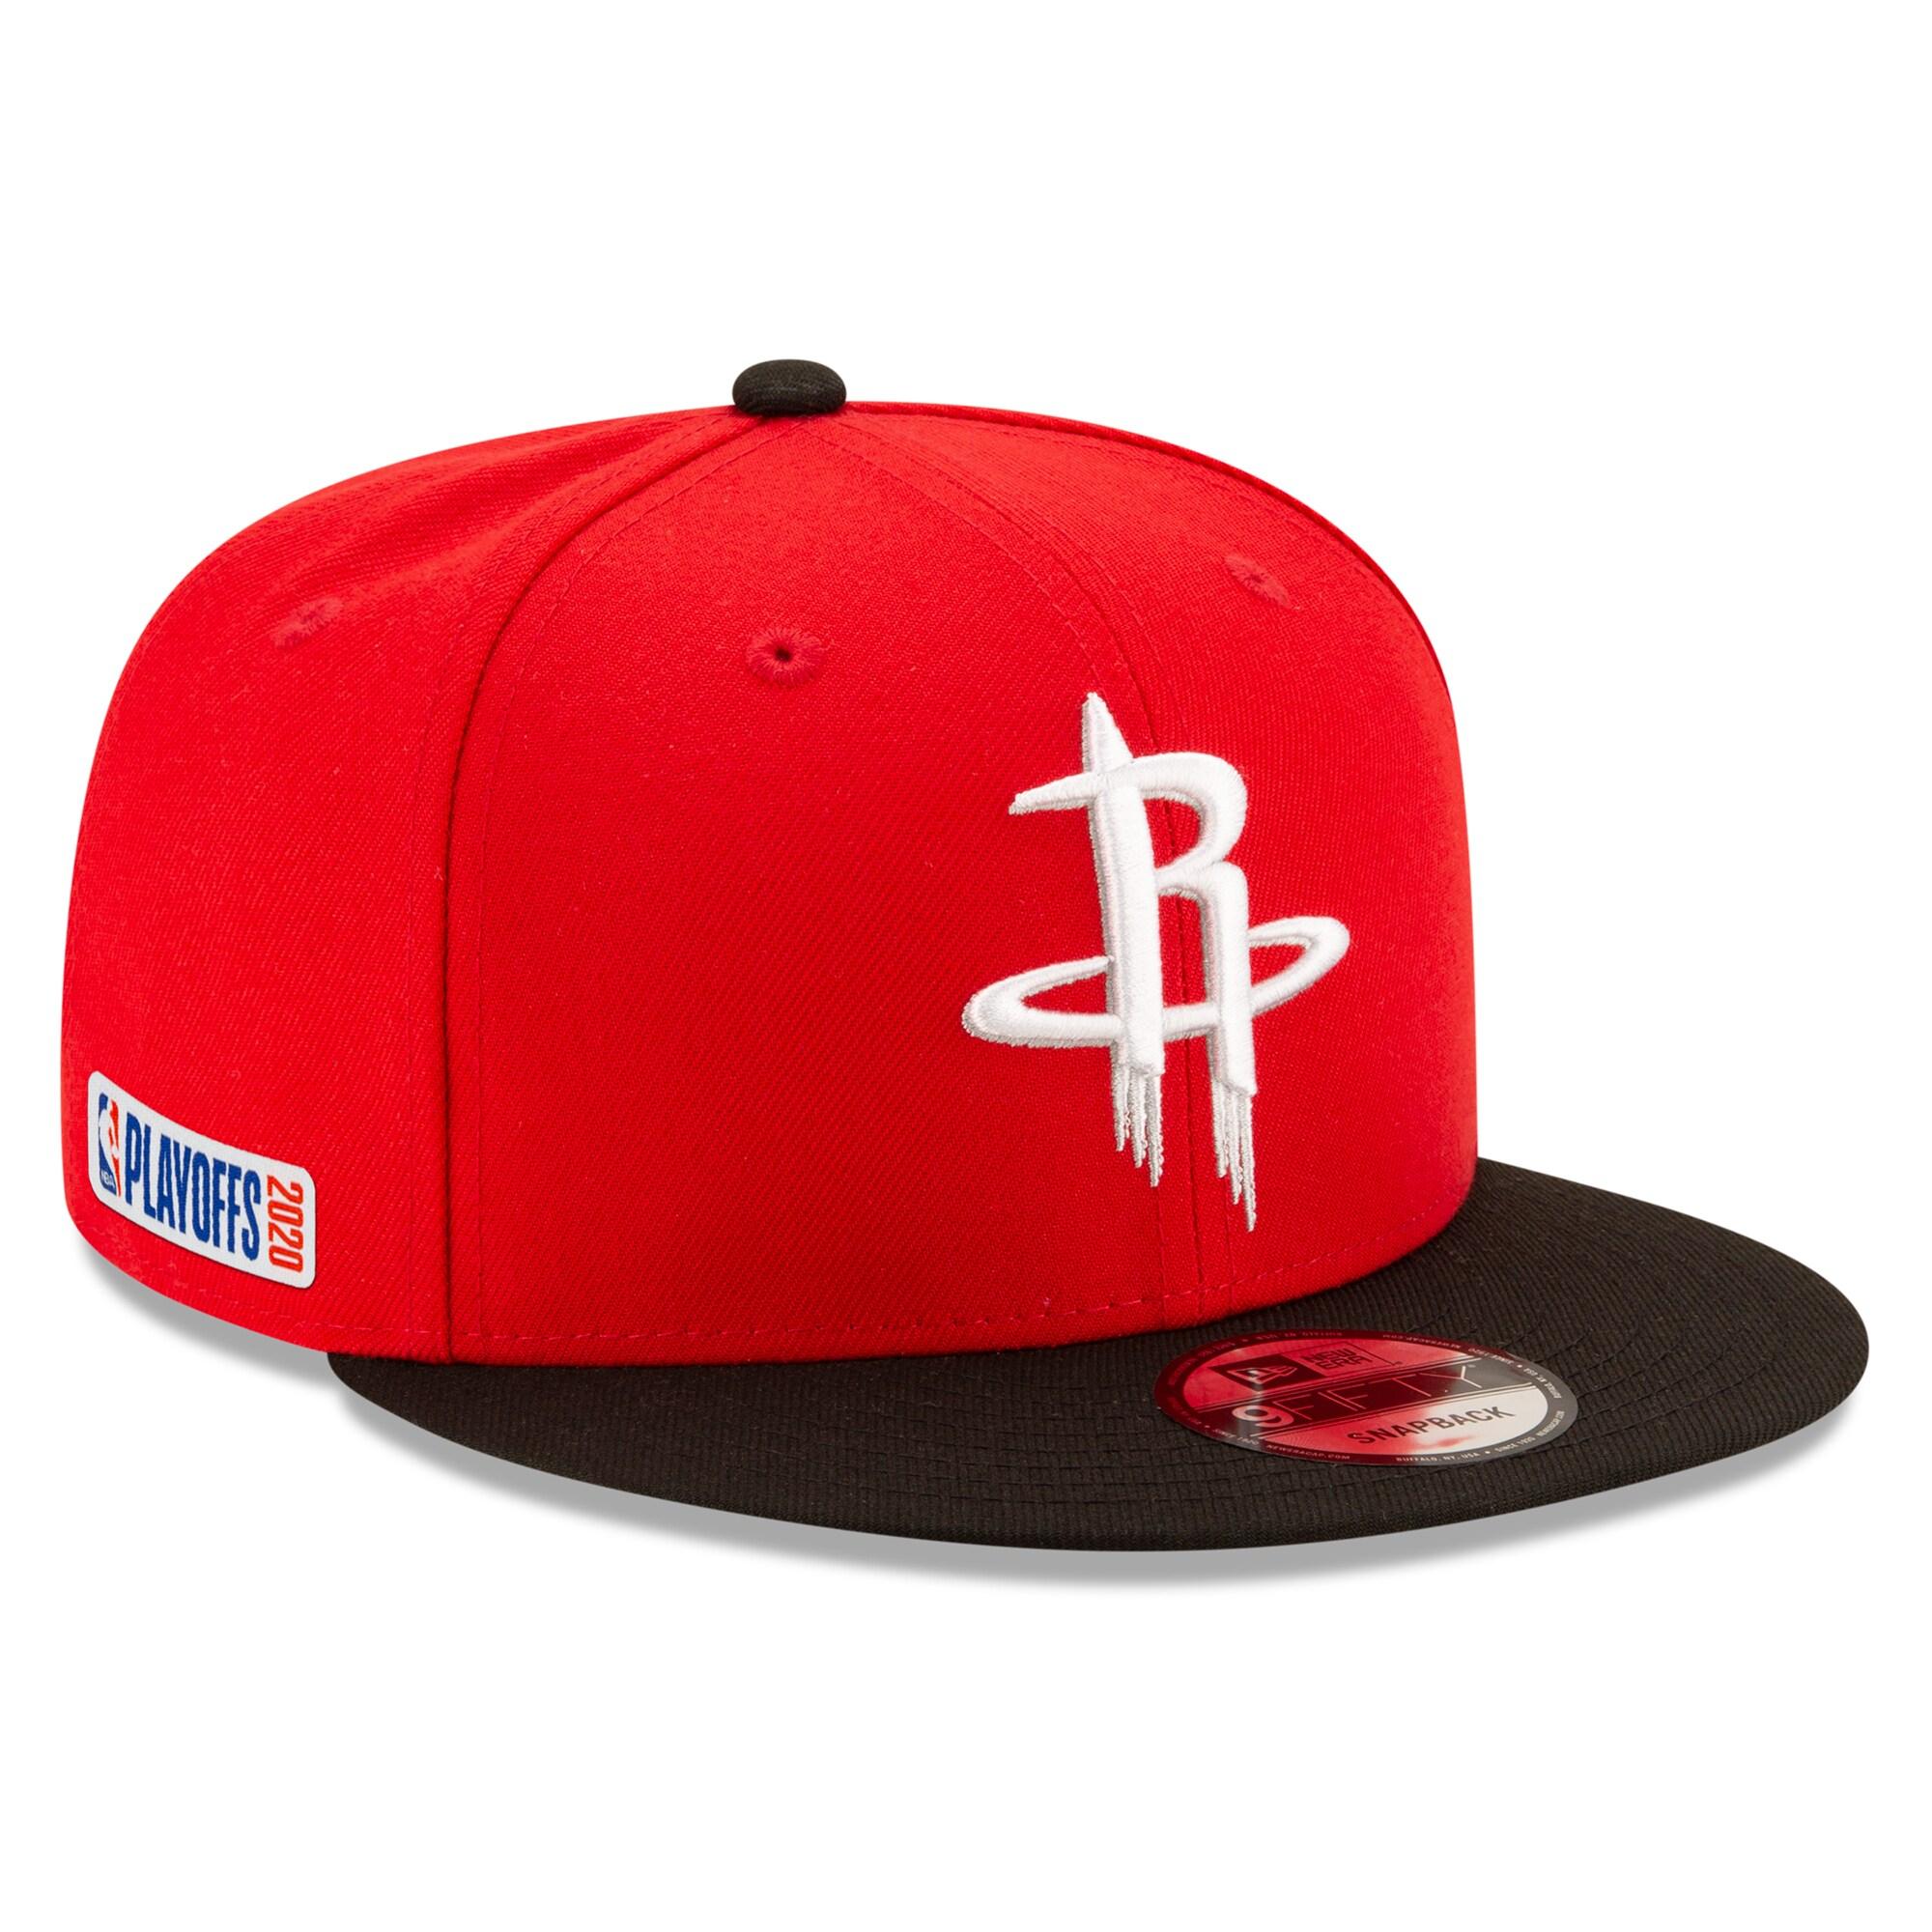 Houston Rockets New Era 2020 NBA Playoffs Bound 2-Tone 9FIFTY Snapback Adjustable Hat - Red